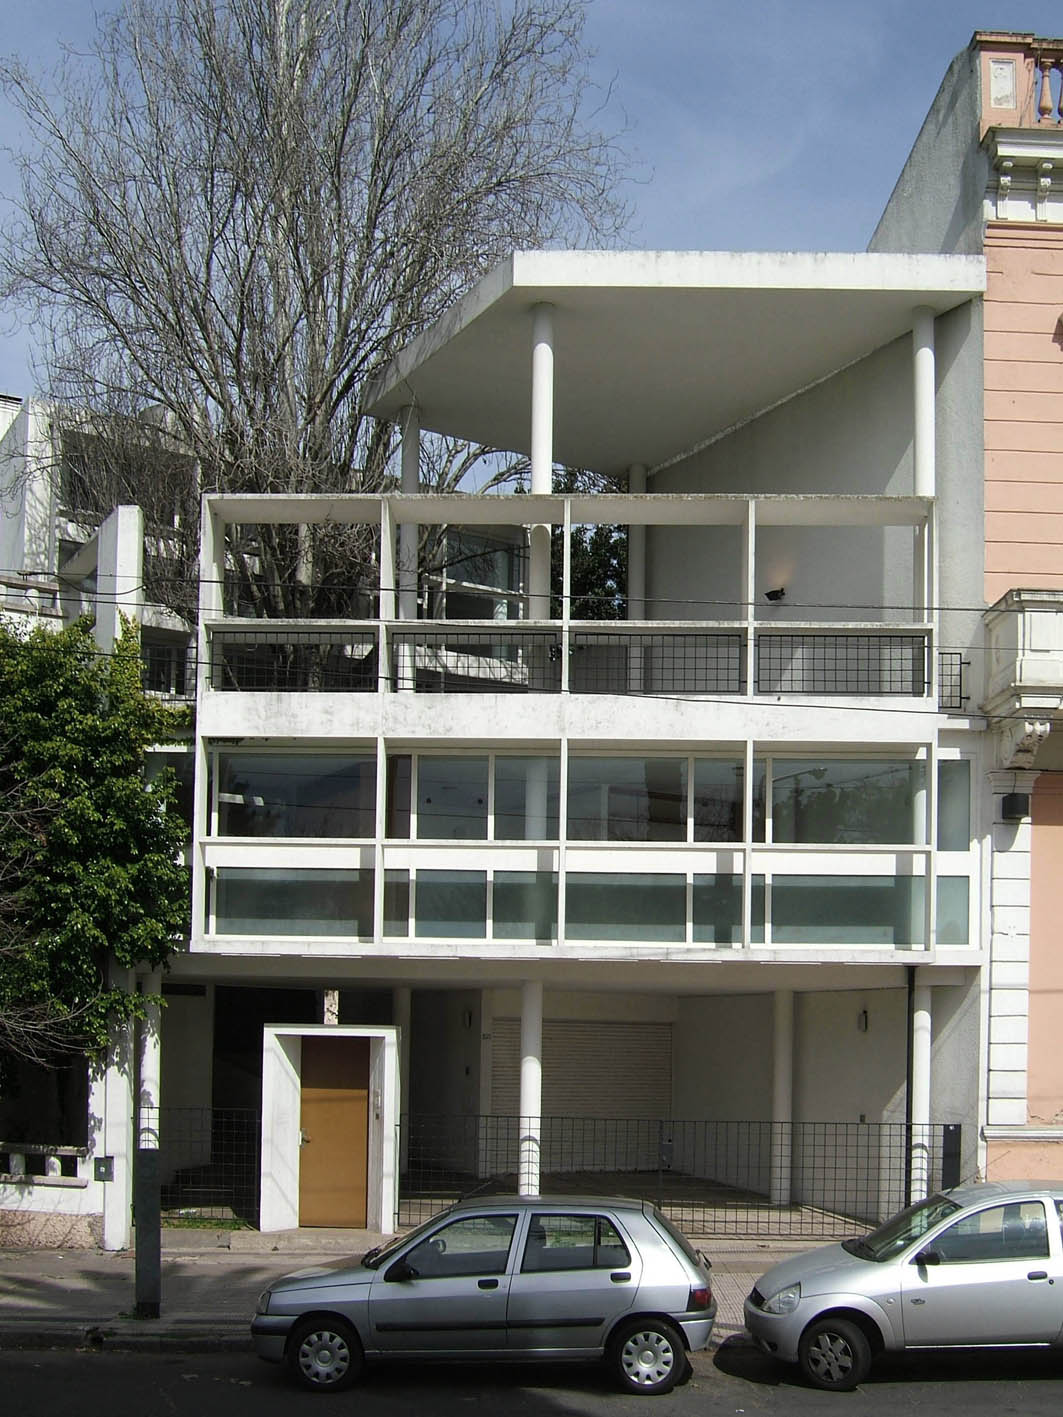 Habitar arquitectura moderna - Le corbusier casas ...